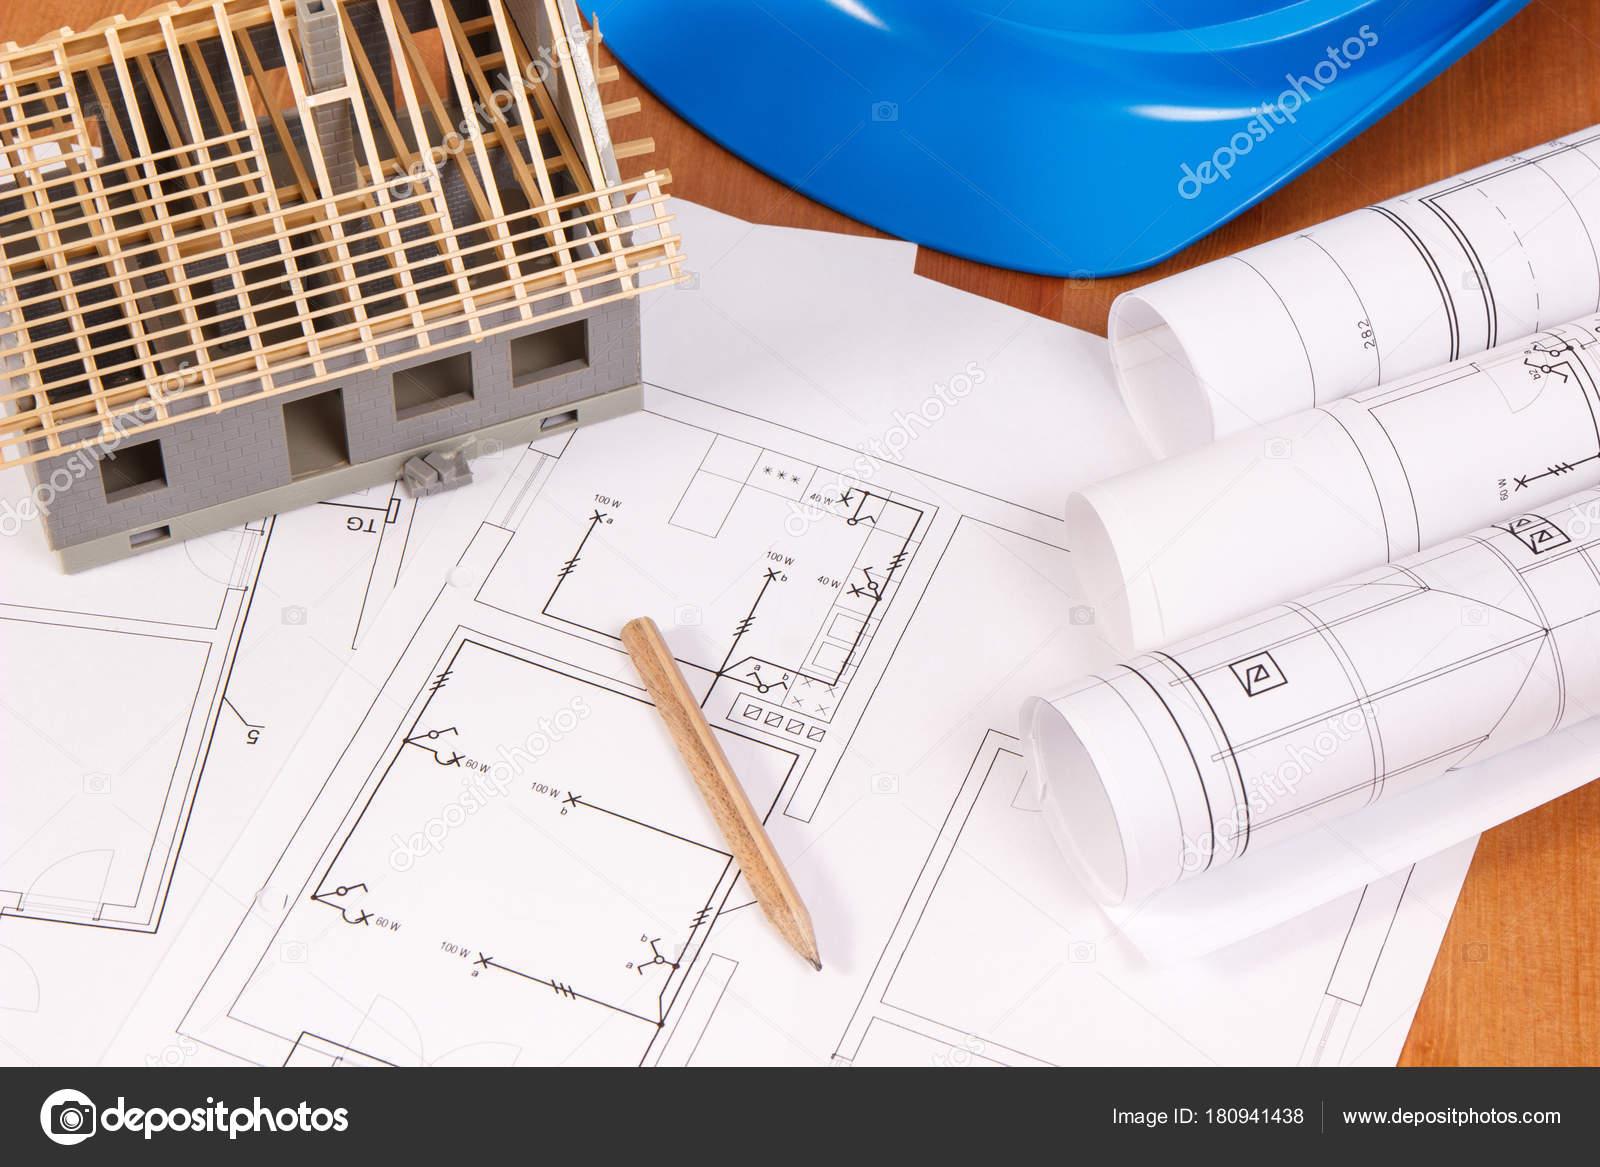 Schemi Elettrici Per Casa : Schemi elettrici o cianografie accessori per casa in costruzione